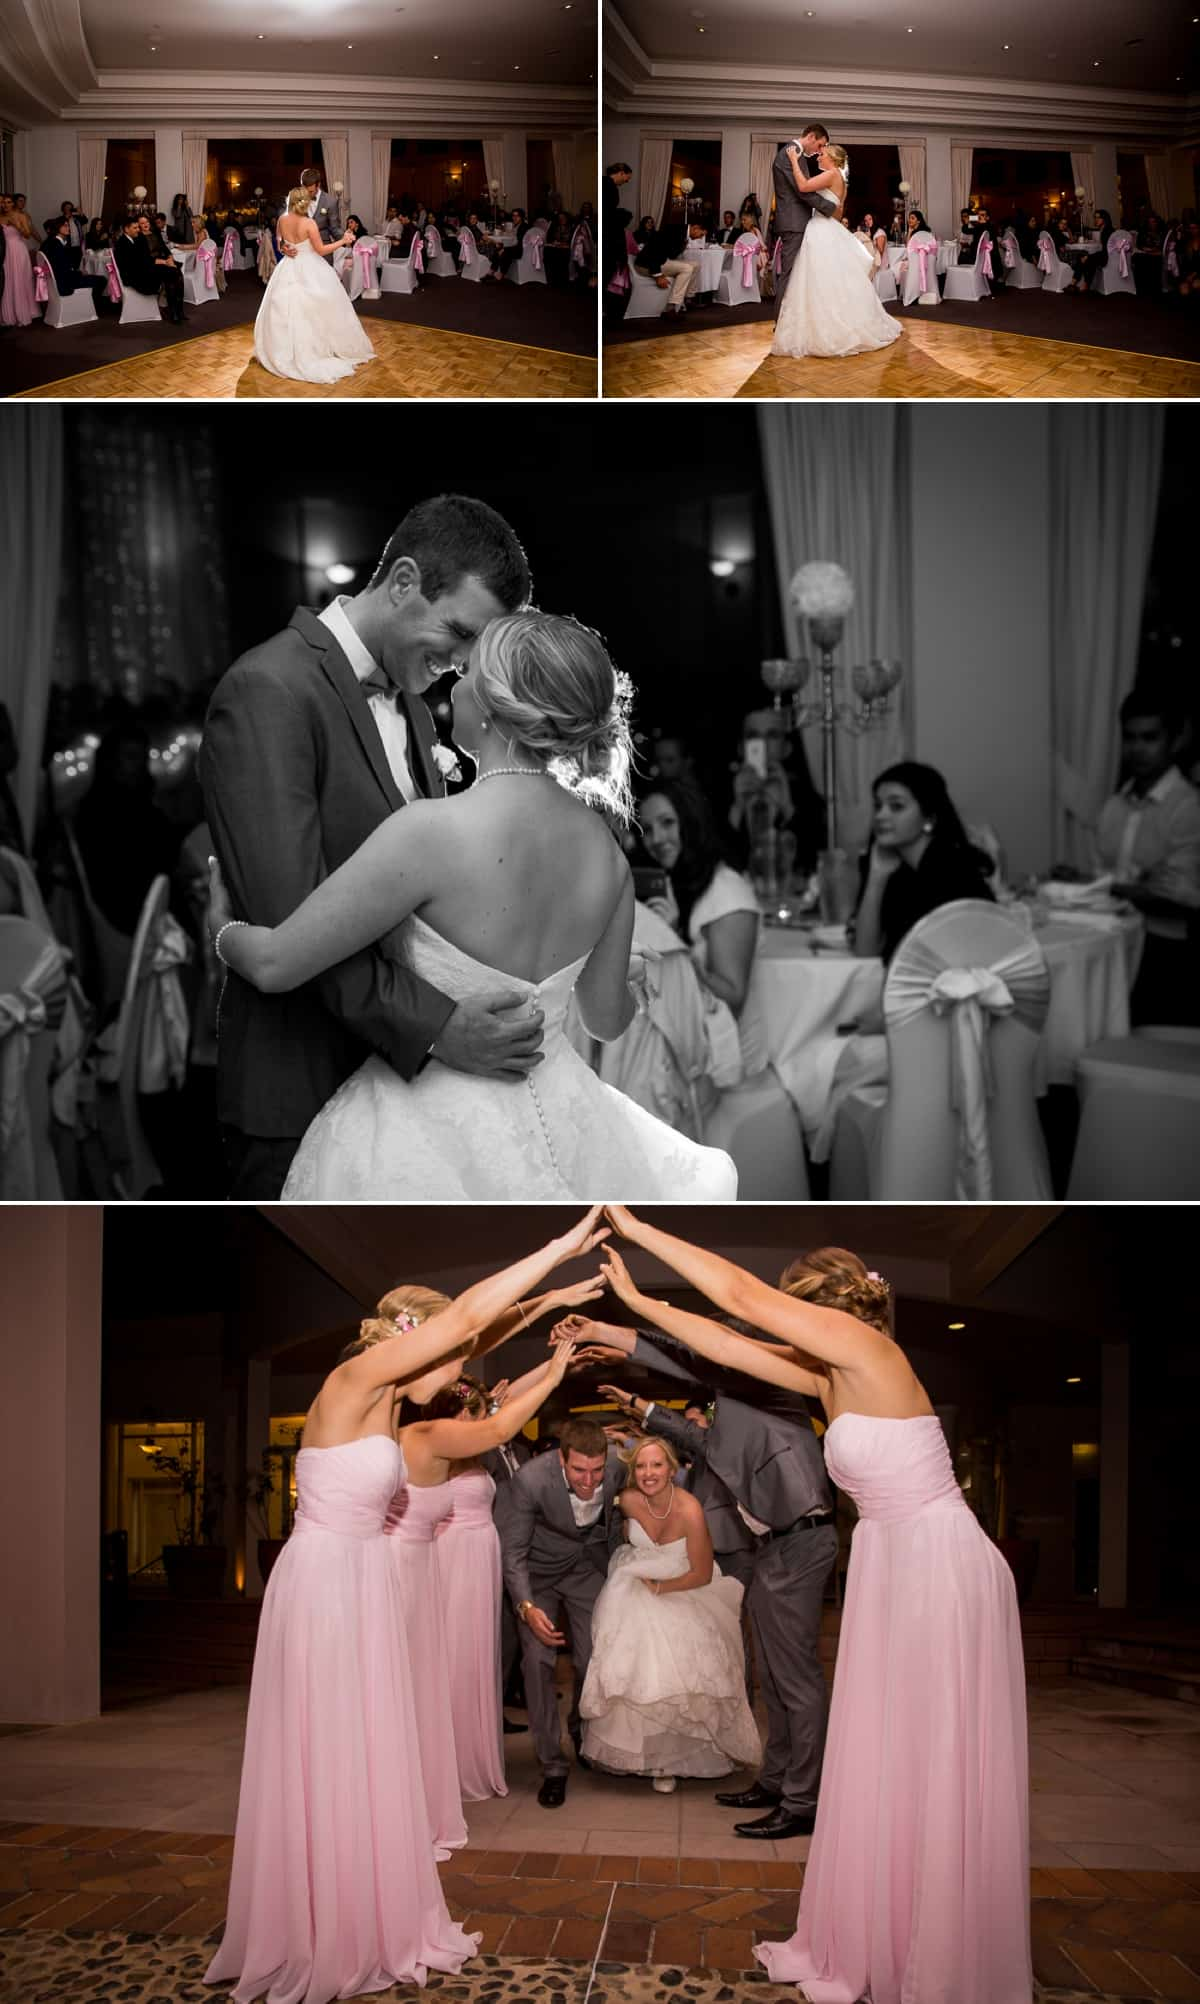 Avalon Gardens wedding www.benandhopeweddings.com.au